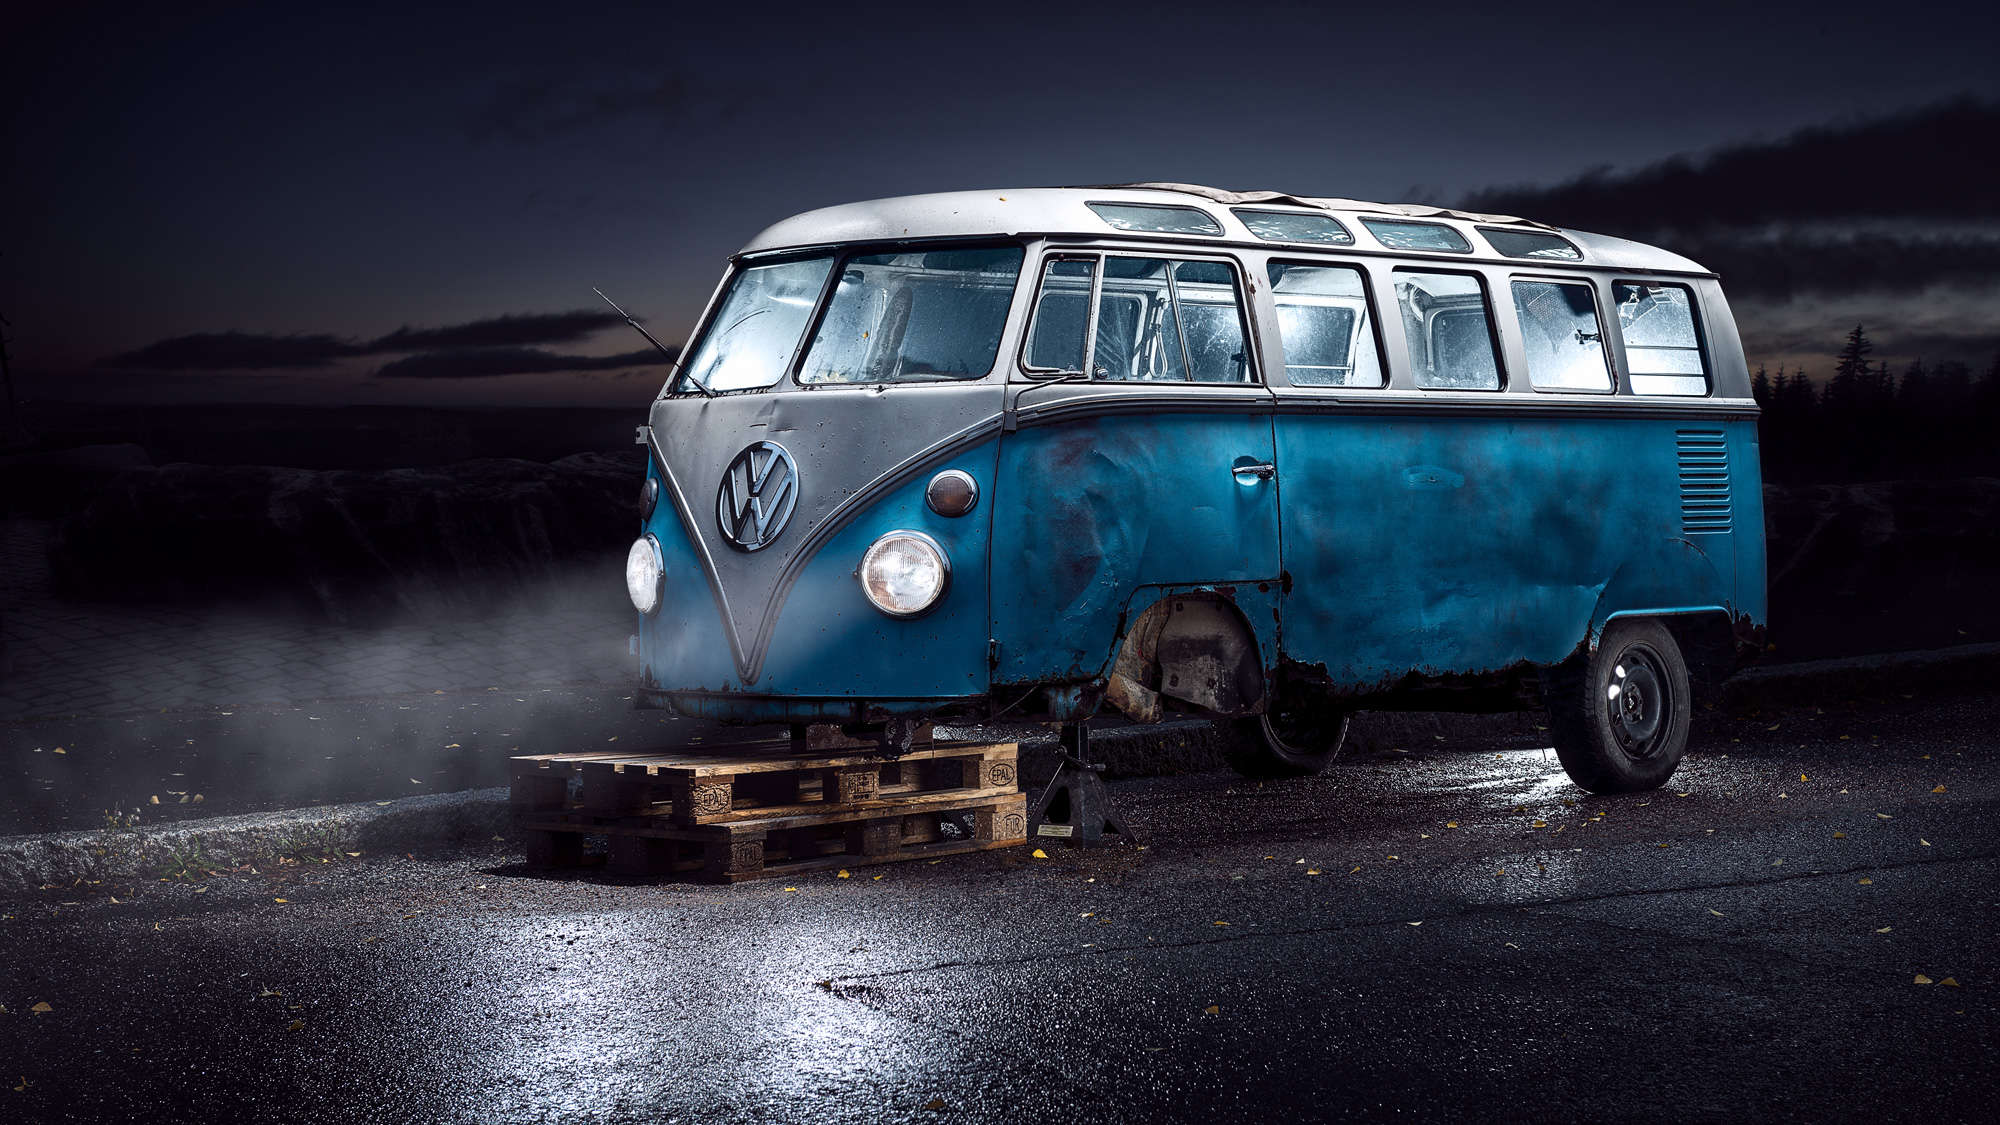 Petri Damstén - Abandoned Volkswagen